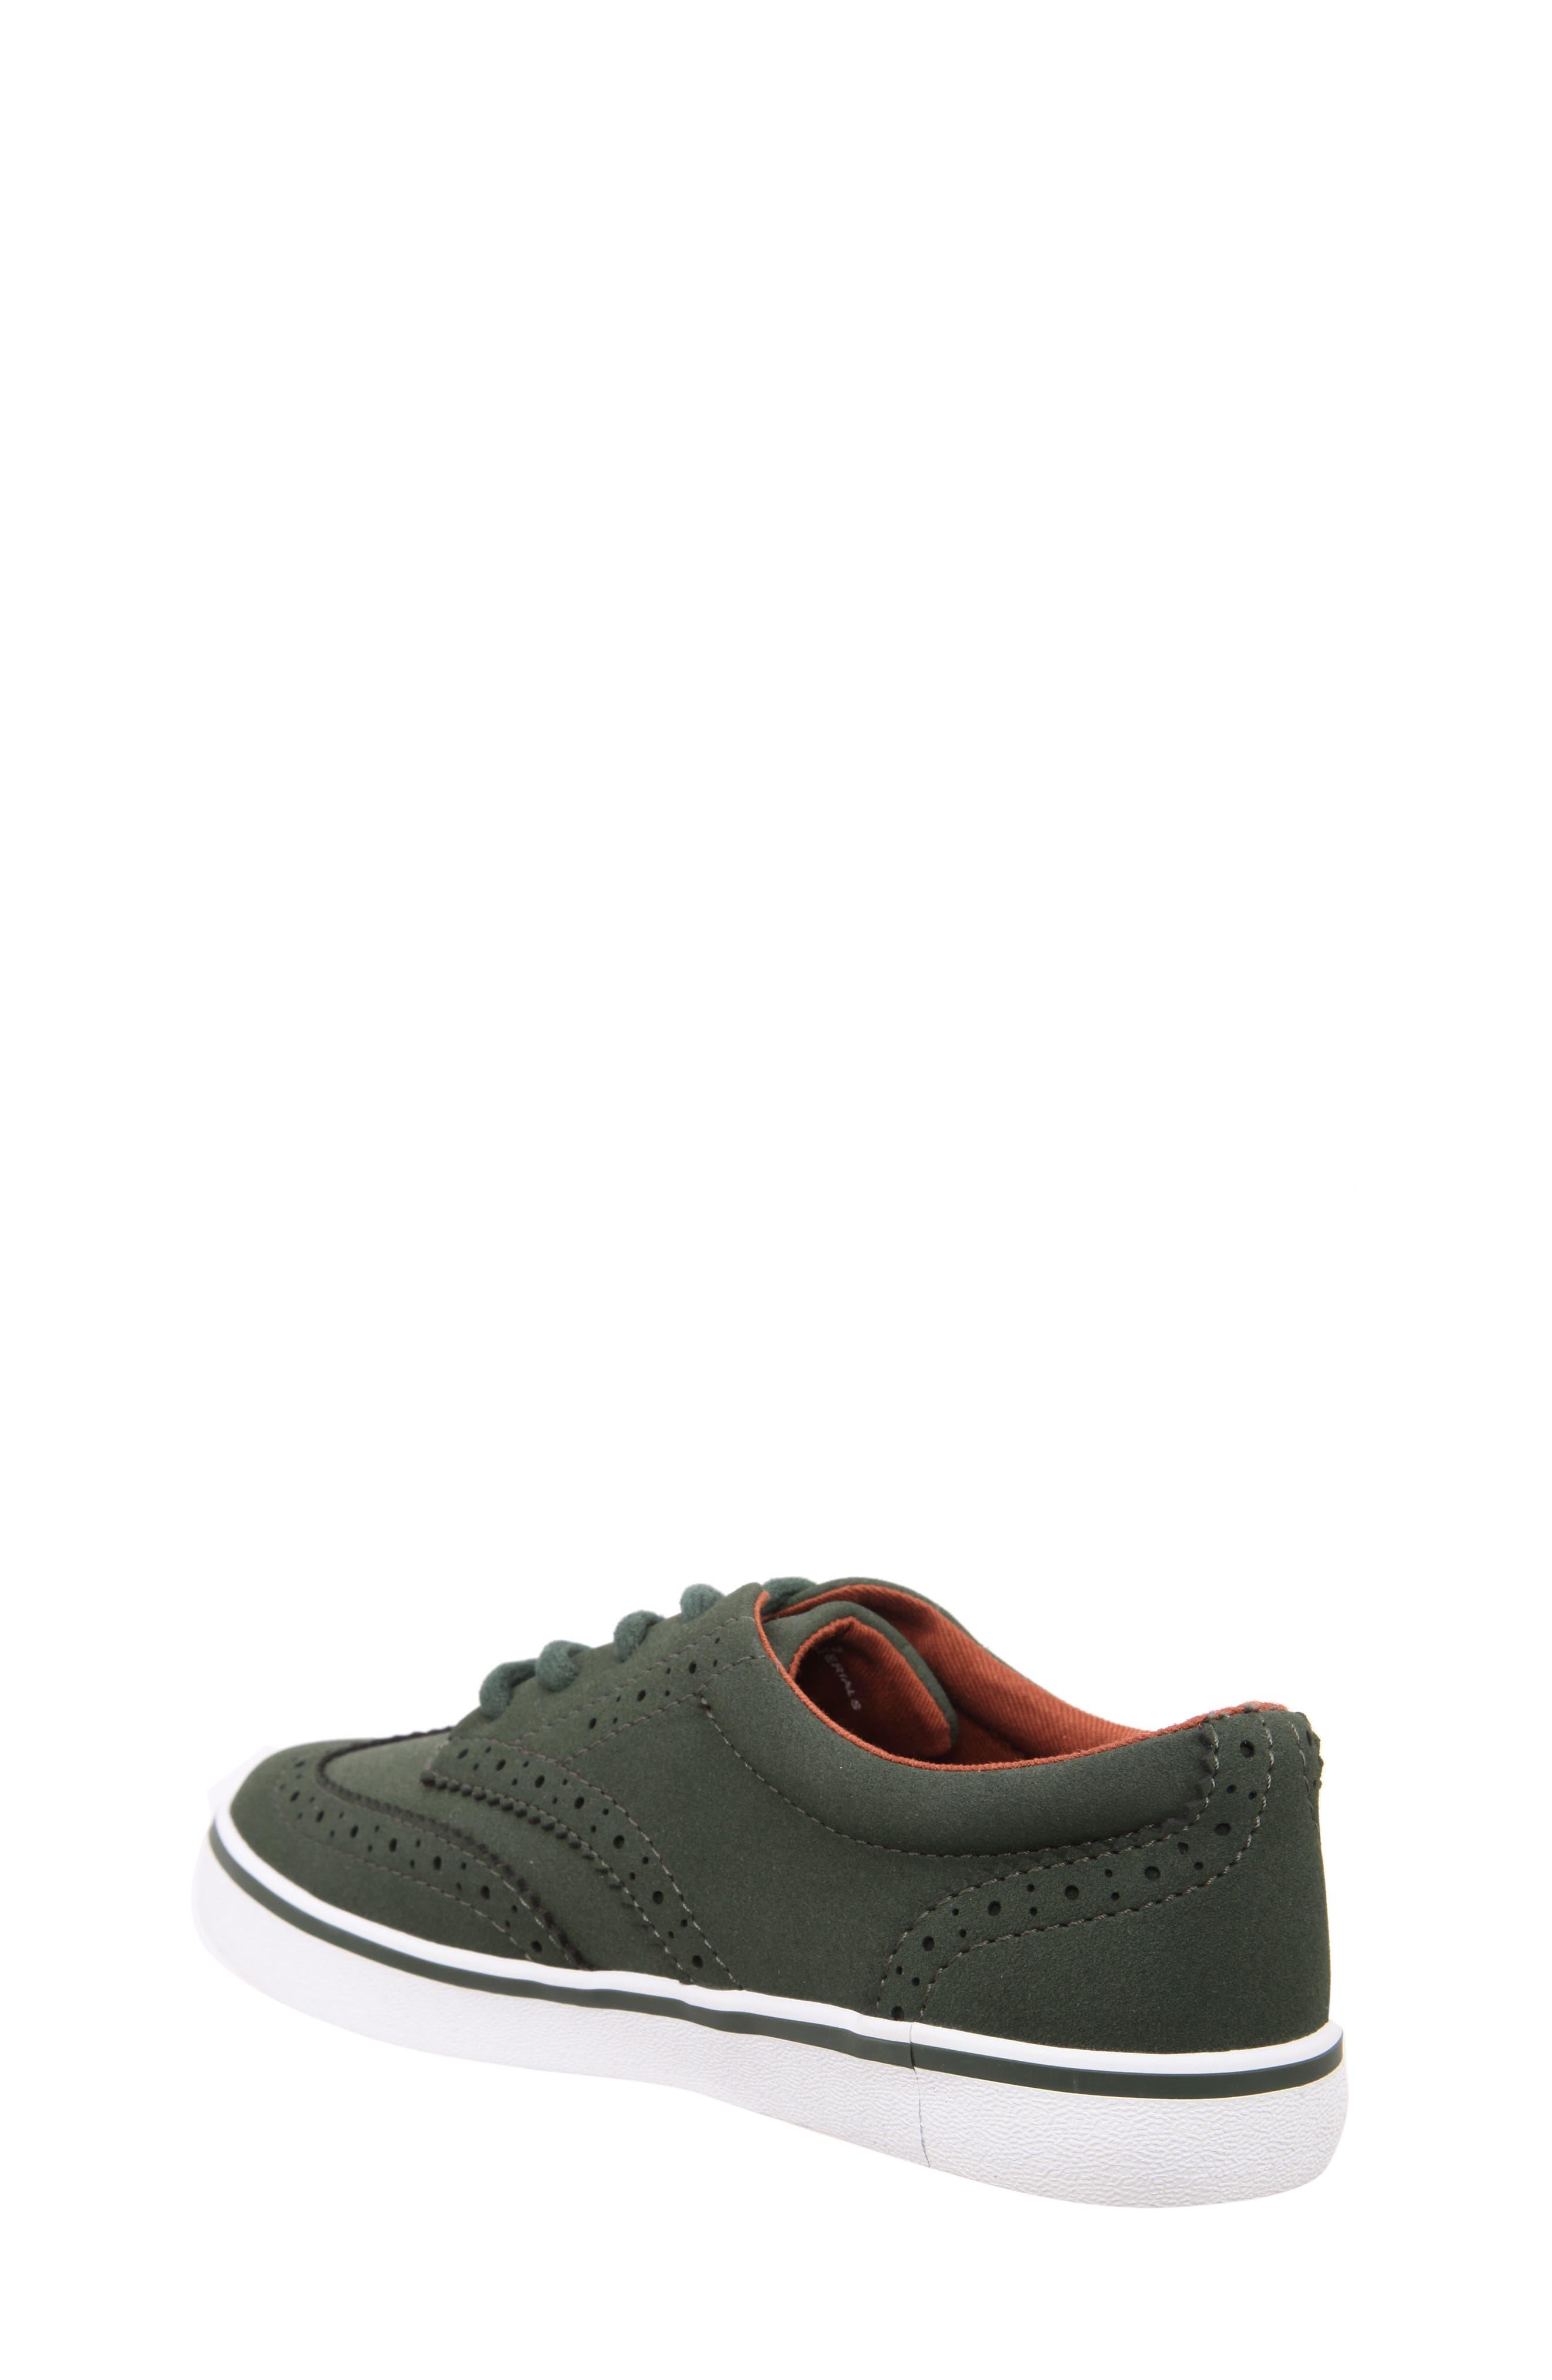 Wingtip Sneaker,                             Alternate thumbnail 2, color,                             Olive Faux Suede